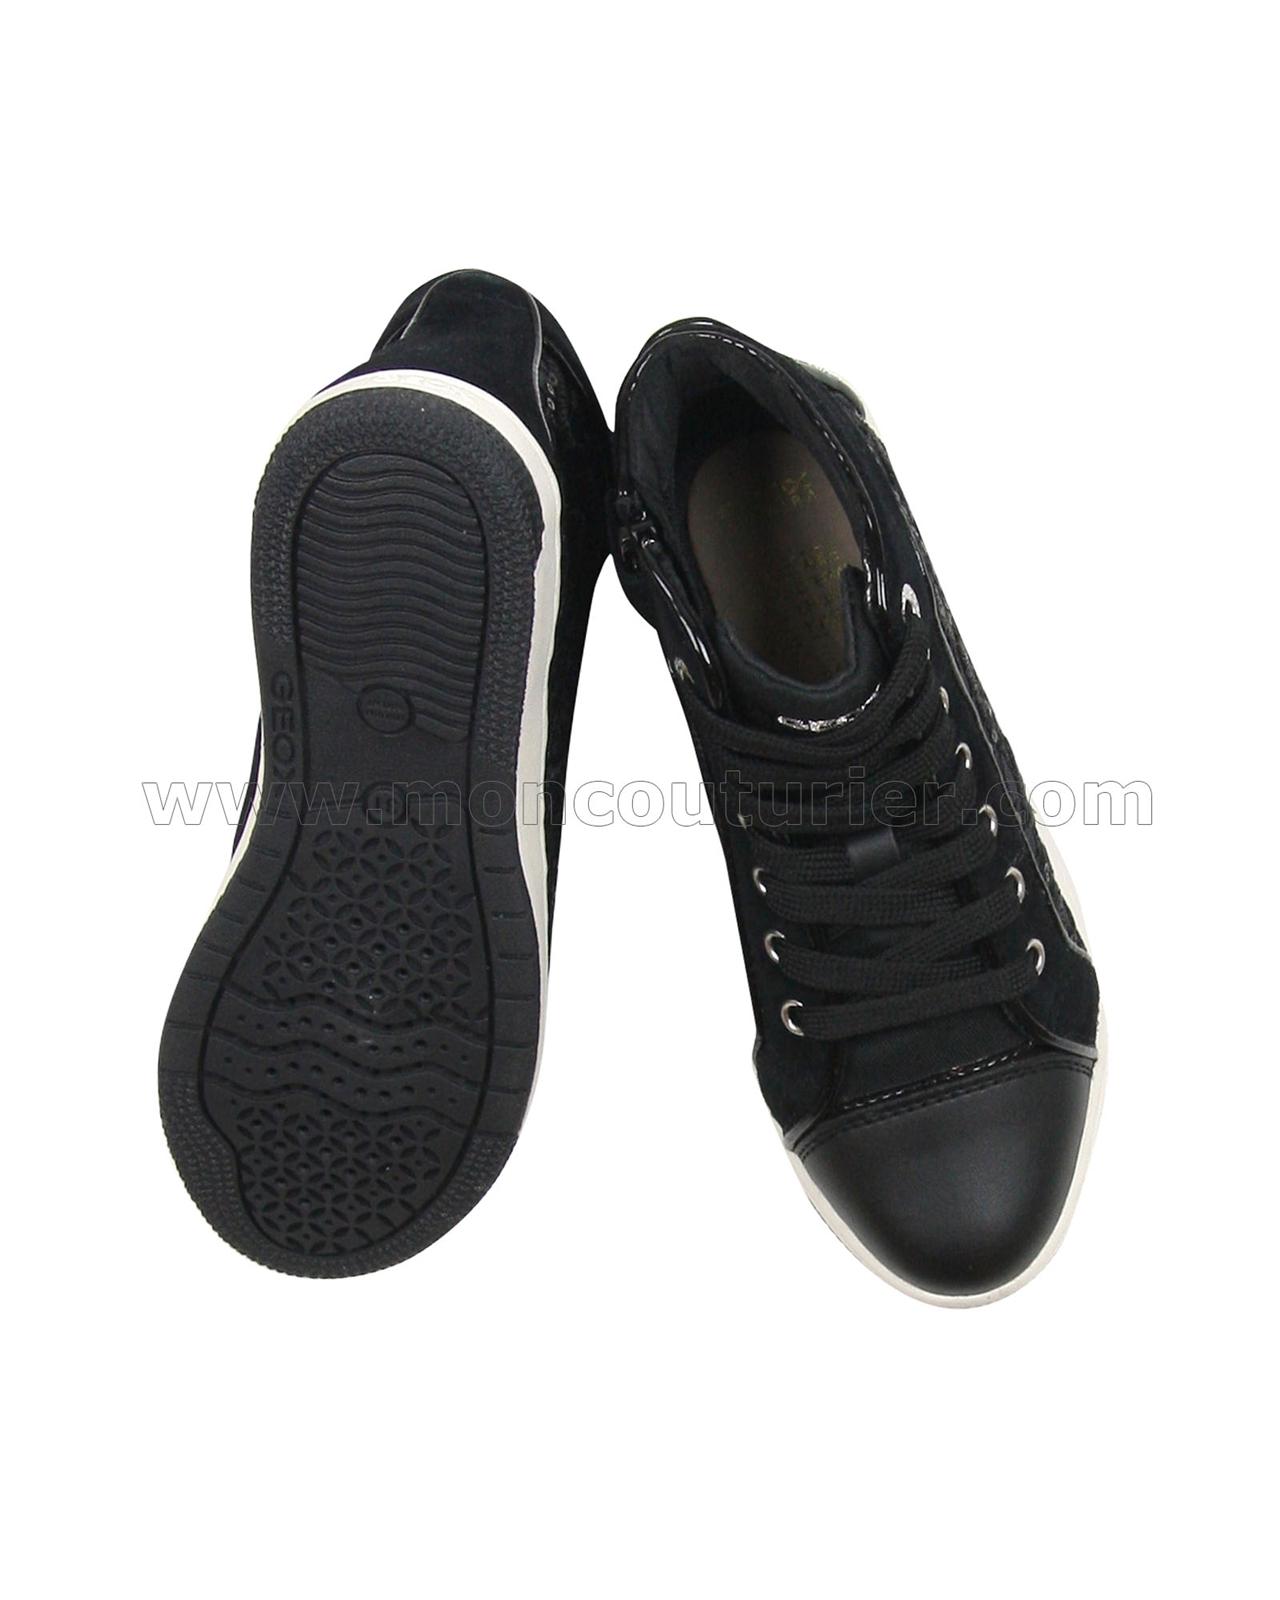 e488ede5b5 GEOX Girls' Hi-top Sneakers Jr Creamy Black